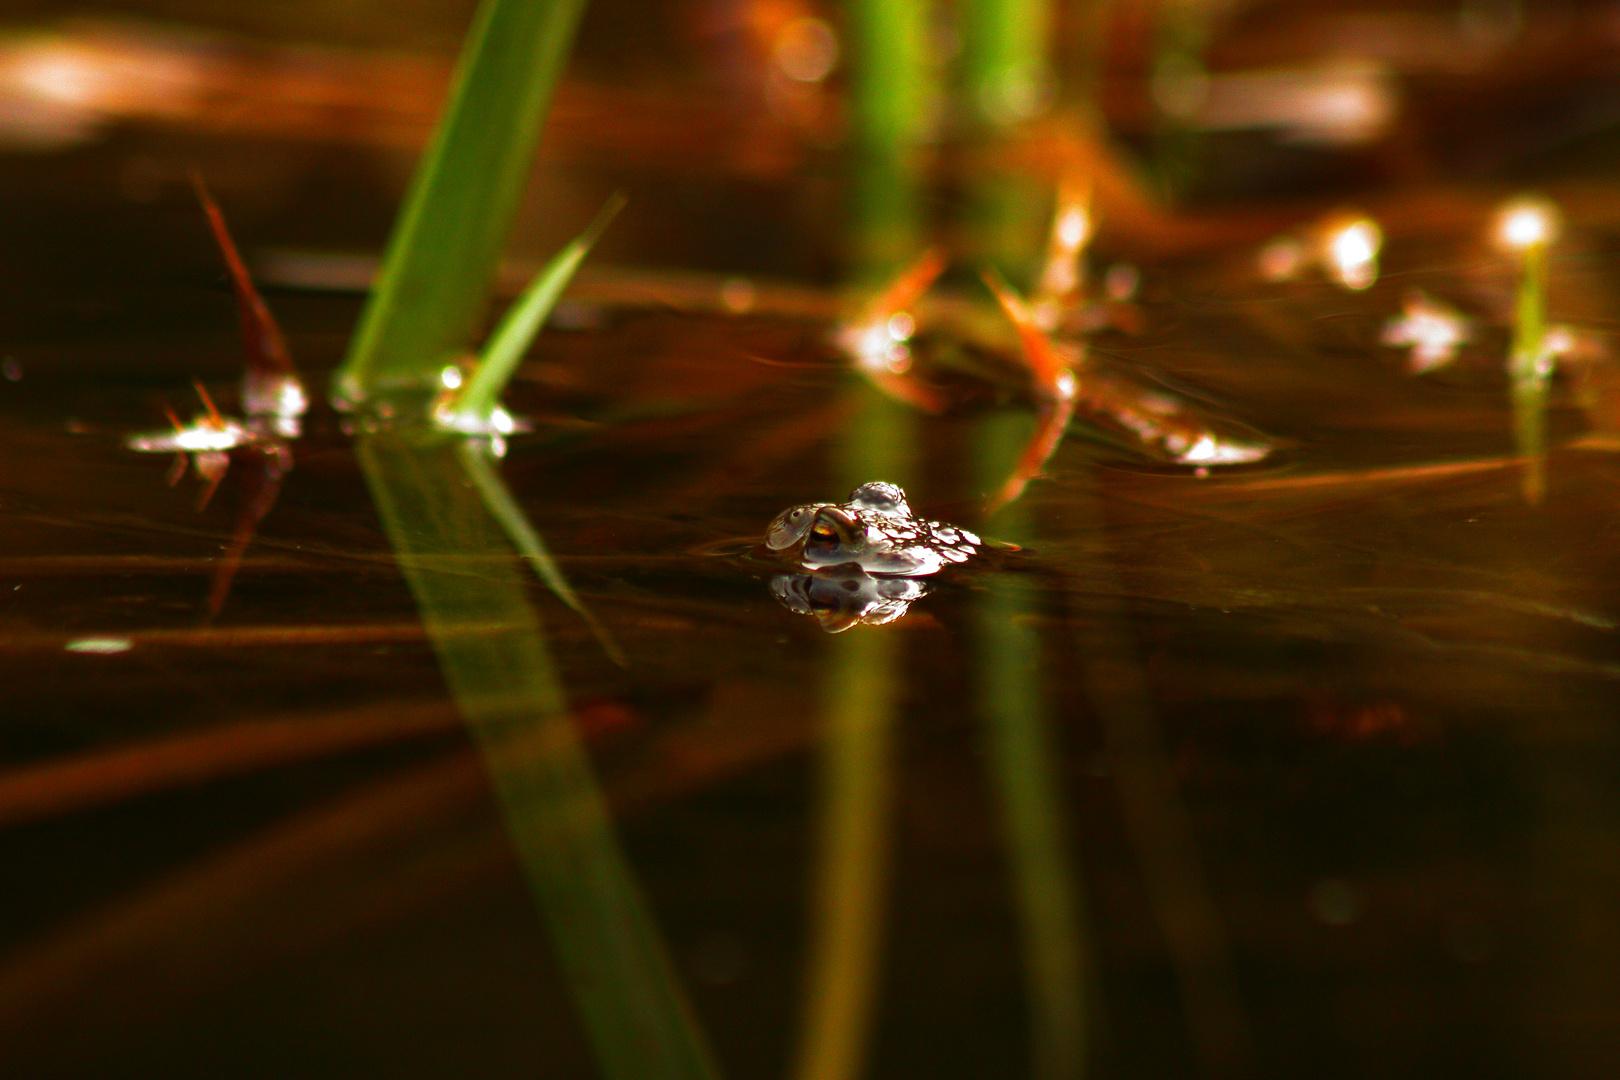 Leben am Teich